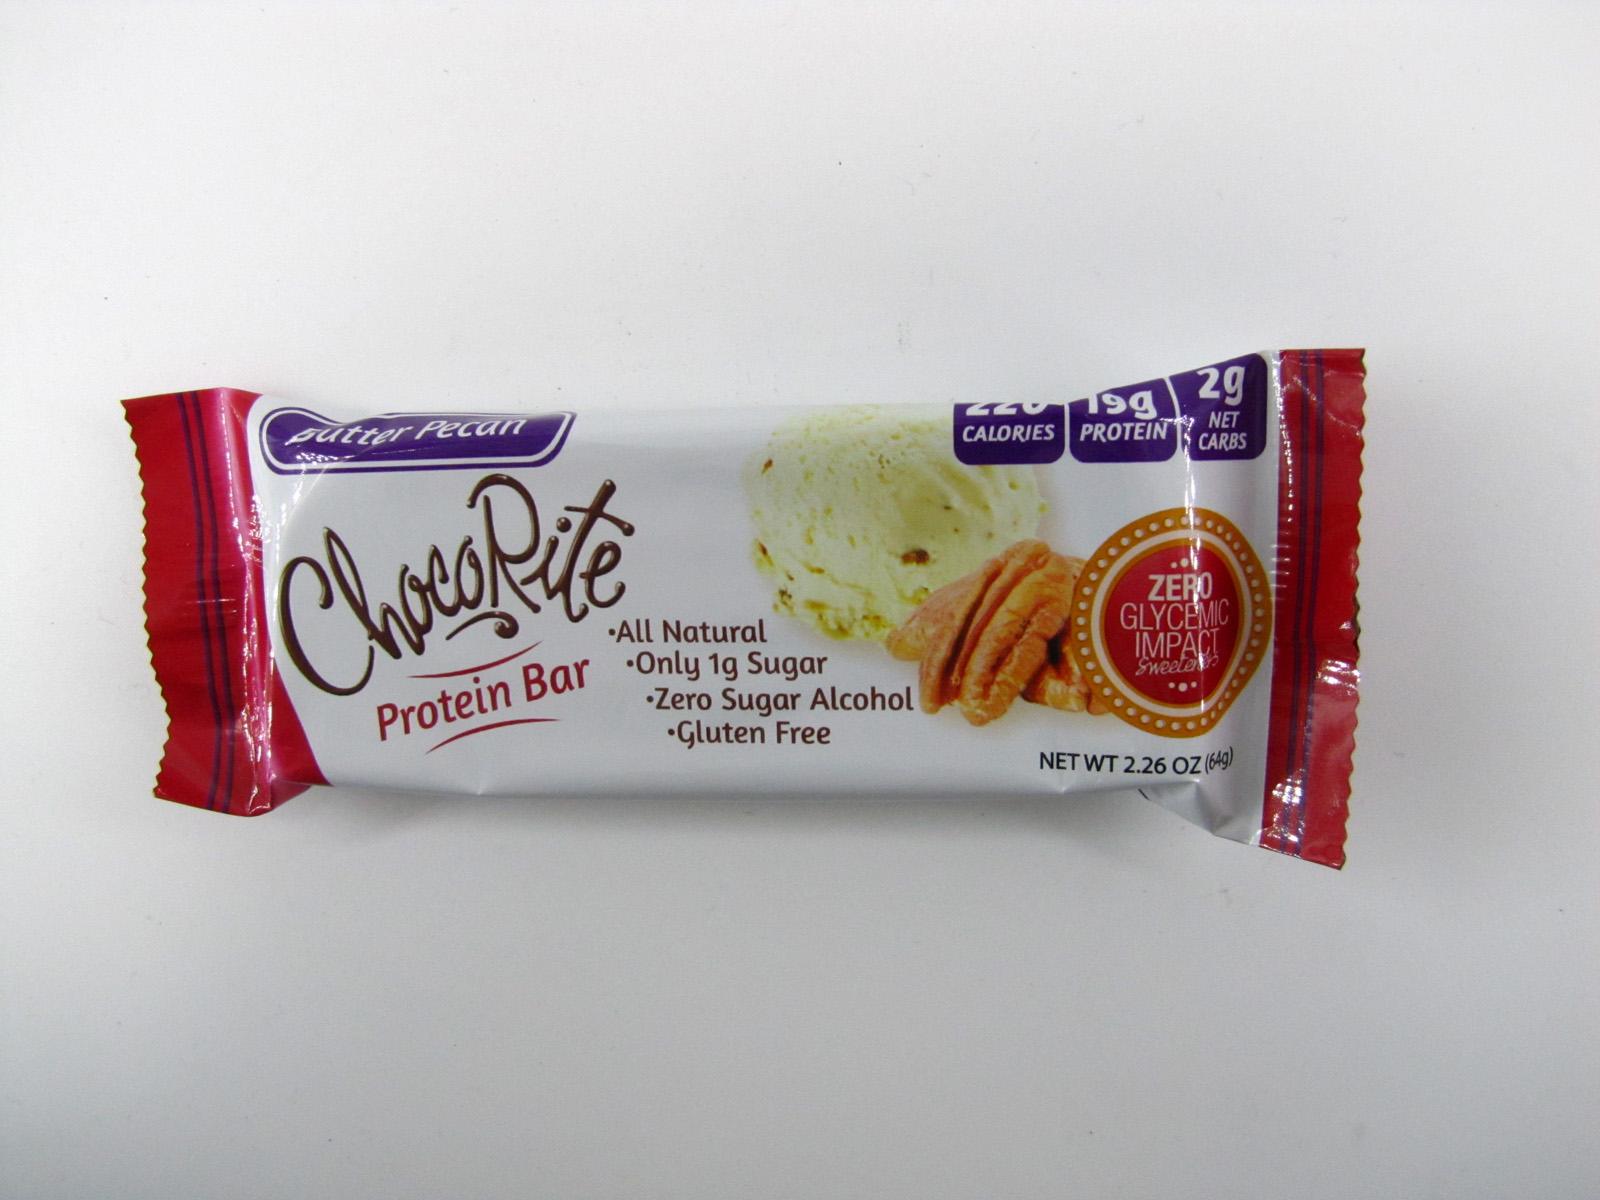 Chocorite Protein Bar (64g) - Butter Pecan - front view